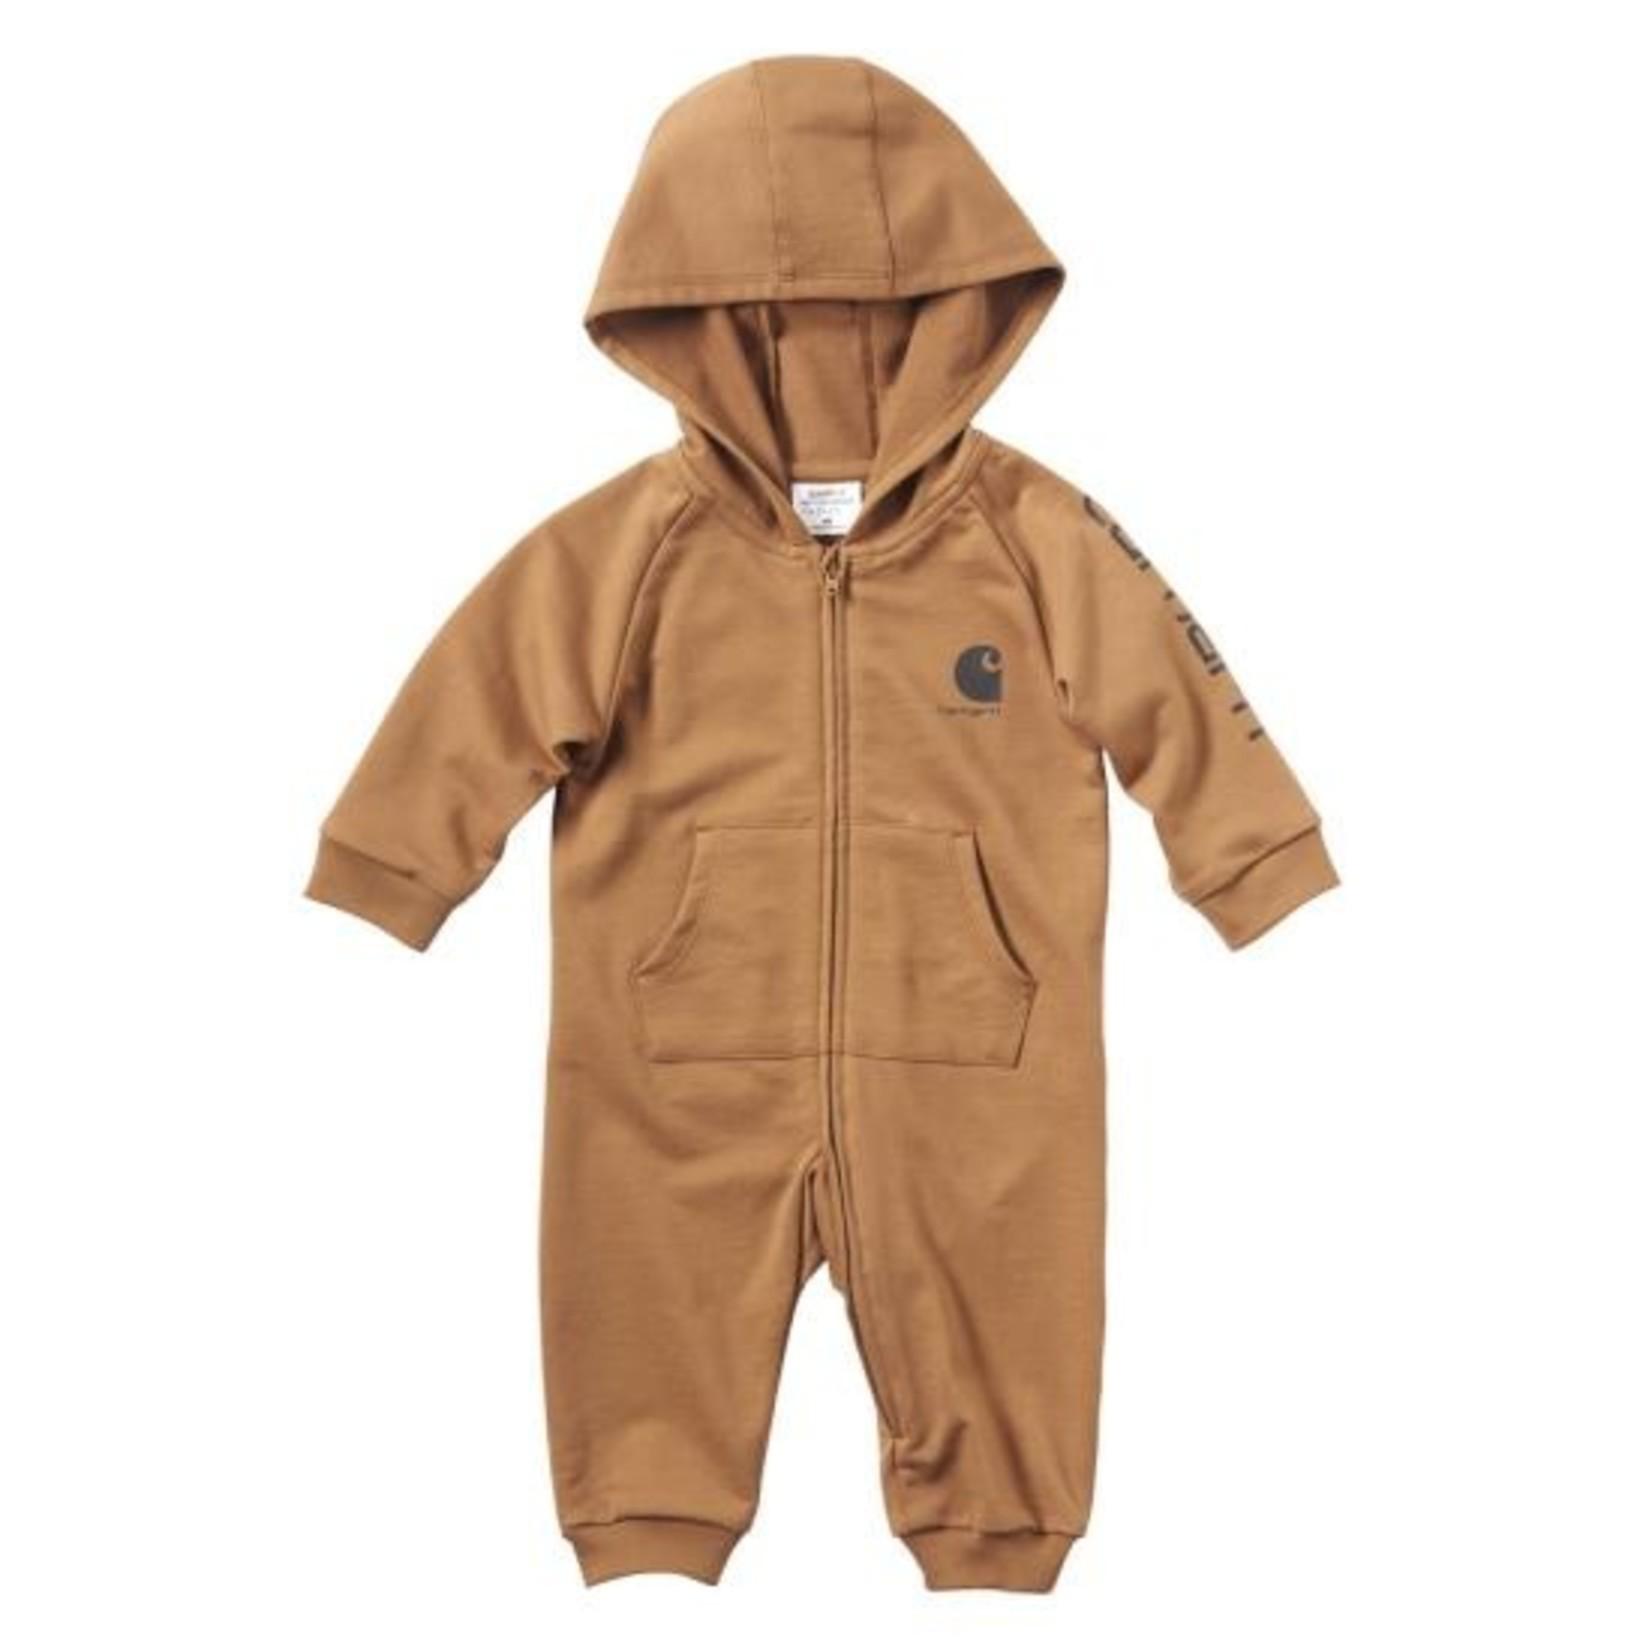 Carhartt Carhartt Kids CM8675 Fleece Zip-Front Coverall